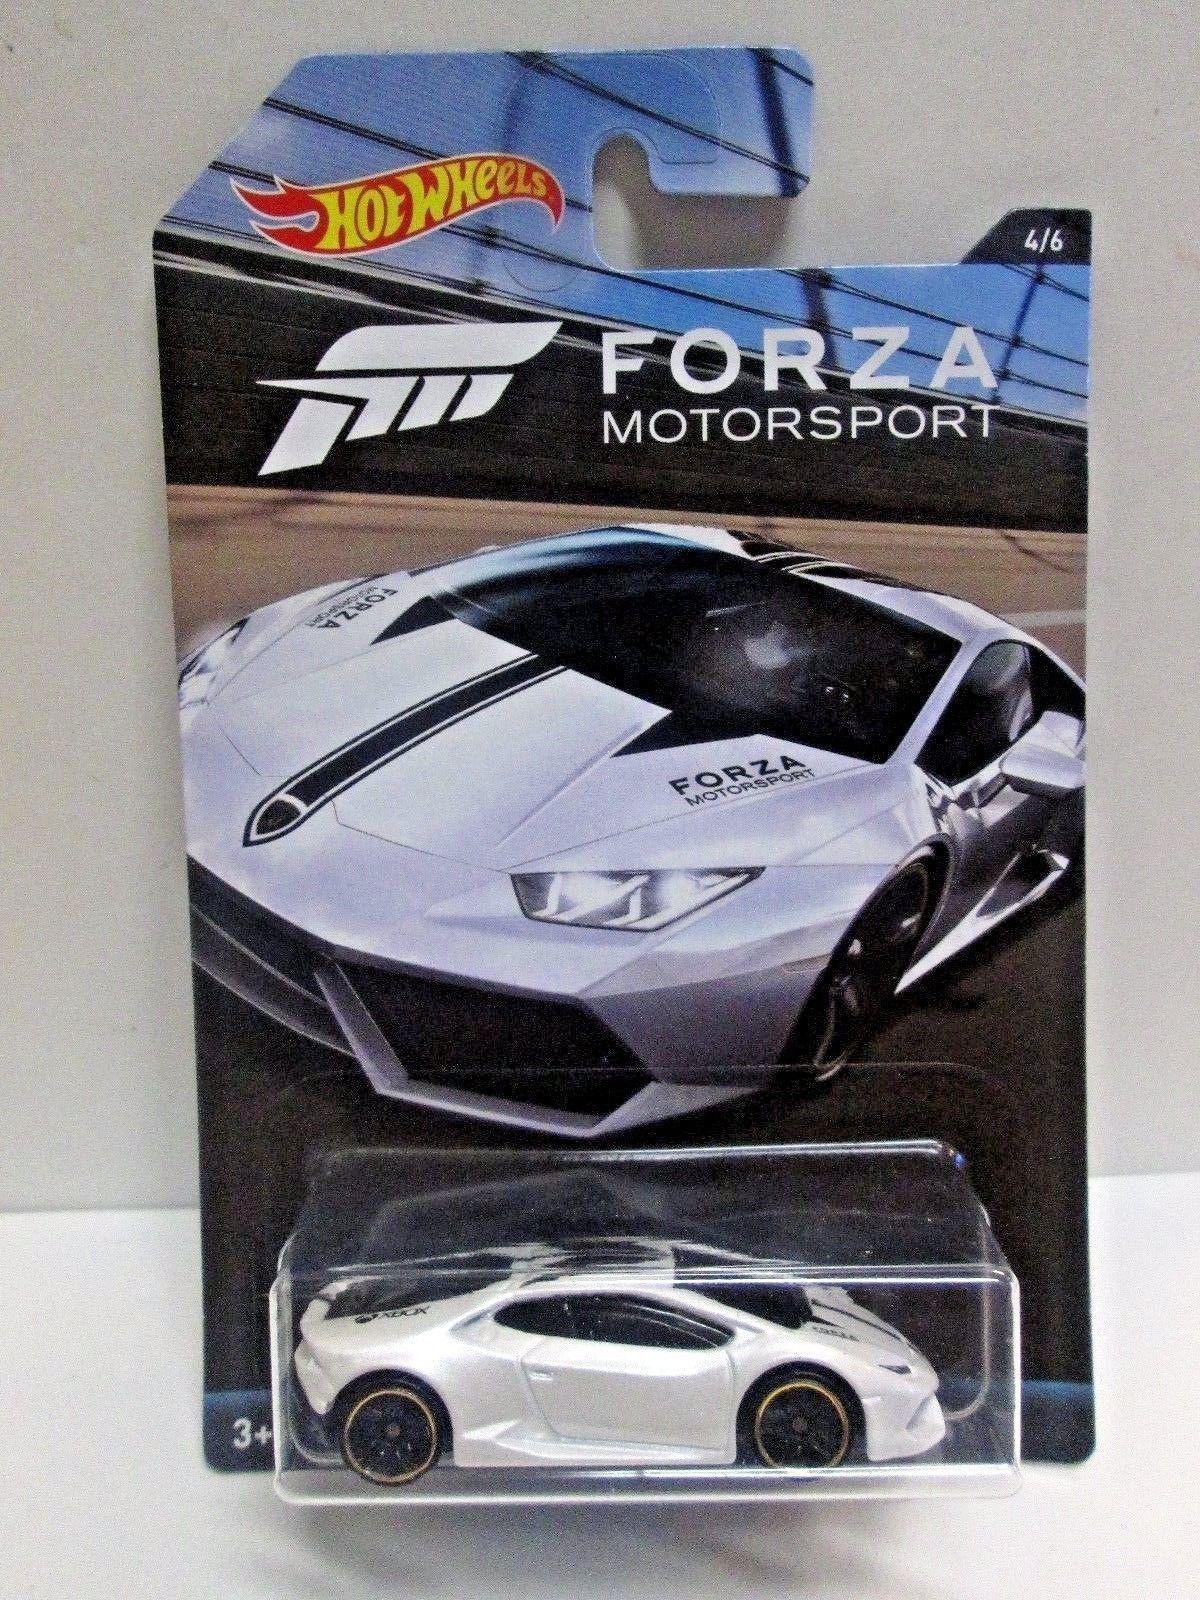 7b7e4f5357f107c08657f1714b9a2ca1 Marvelous Lamborghini Huracan Hack asphalt 8 Cars Trend